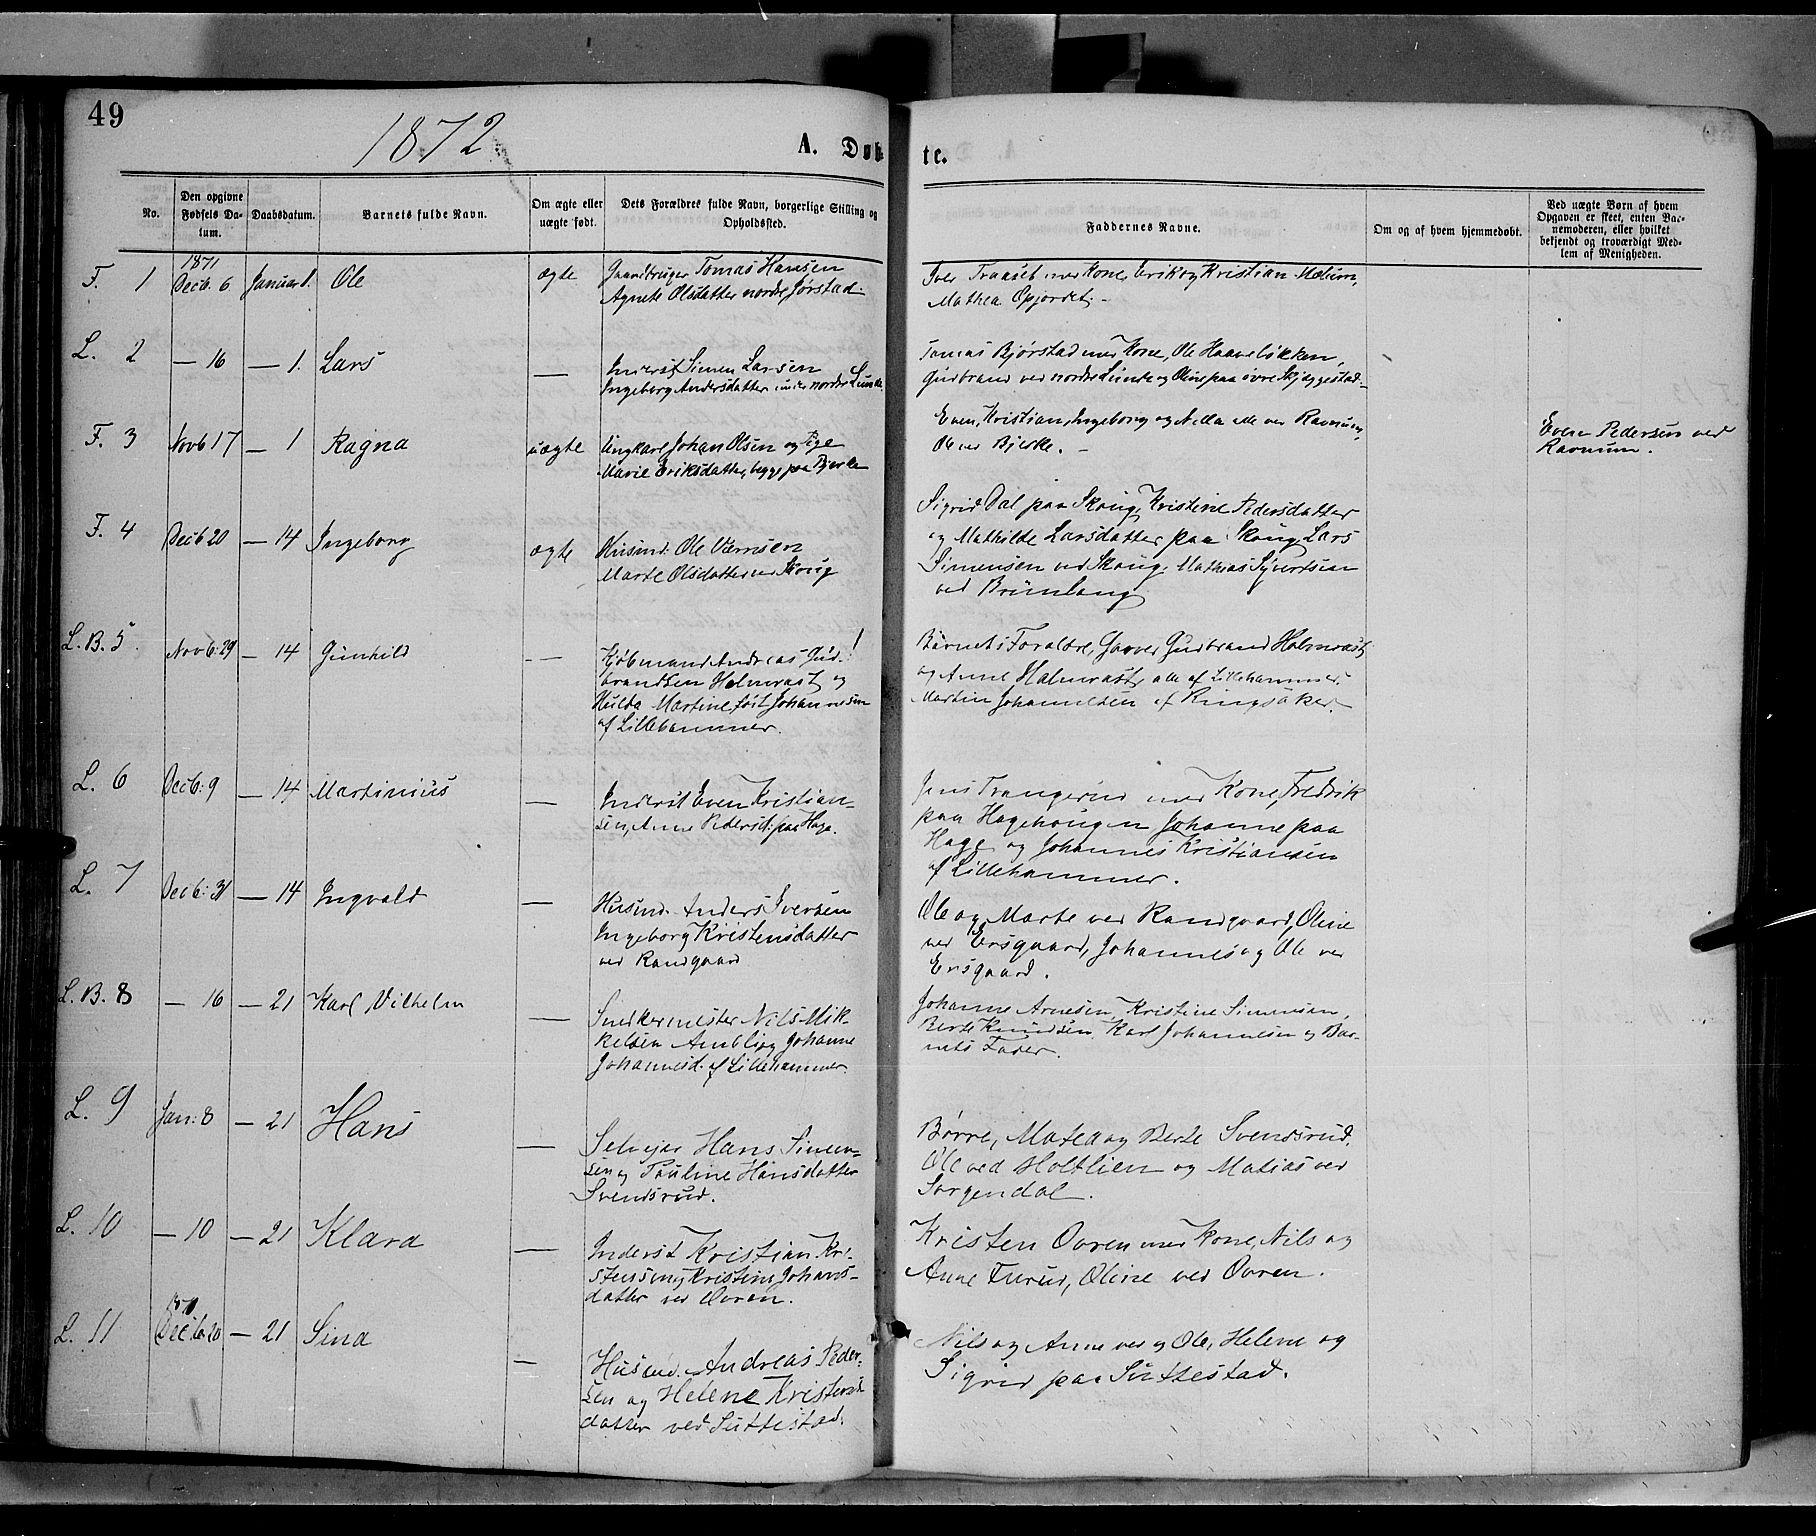 SAH, Fåberg prestekontor, Ministerialbok nr. 7, 1868-1878, s. 49